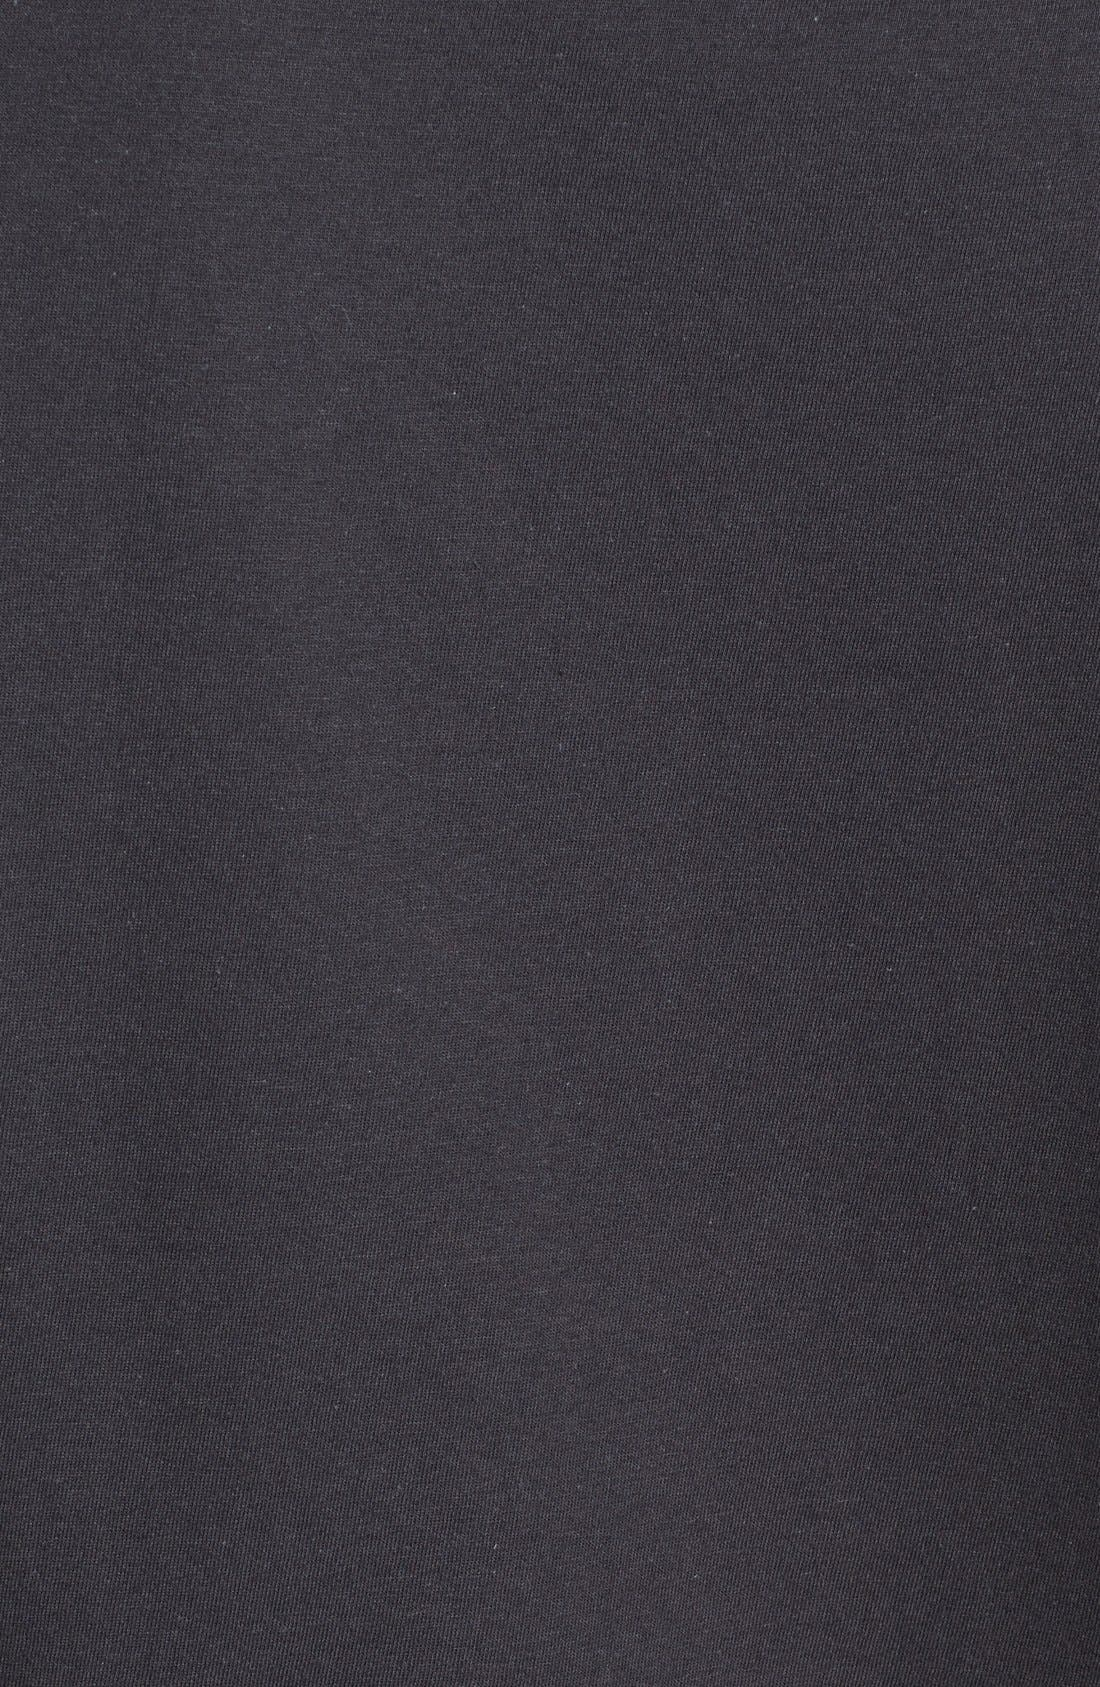 Alternate Image 3  - Topman Oversized Sleeveless Crewneck T-Shirt